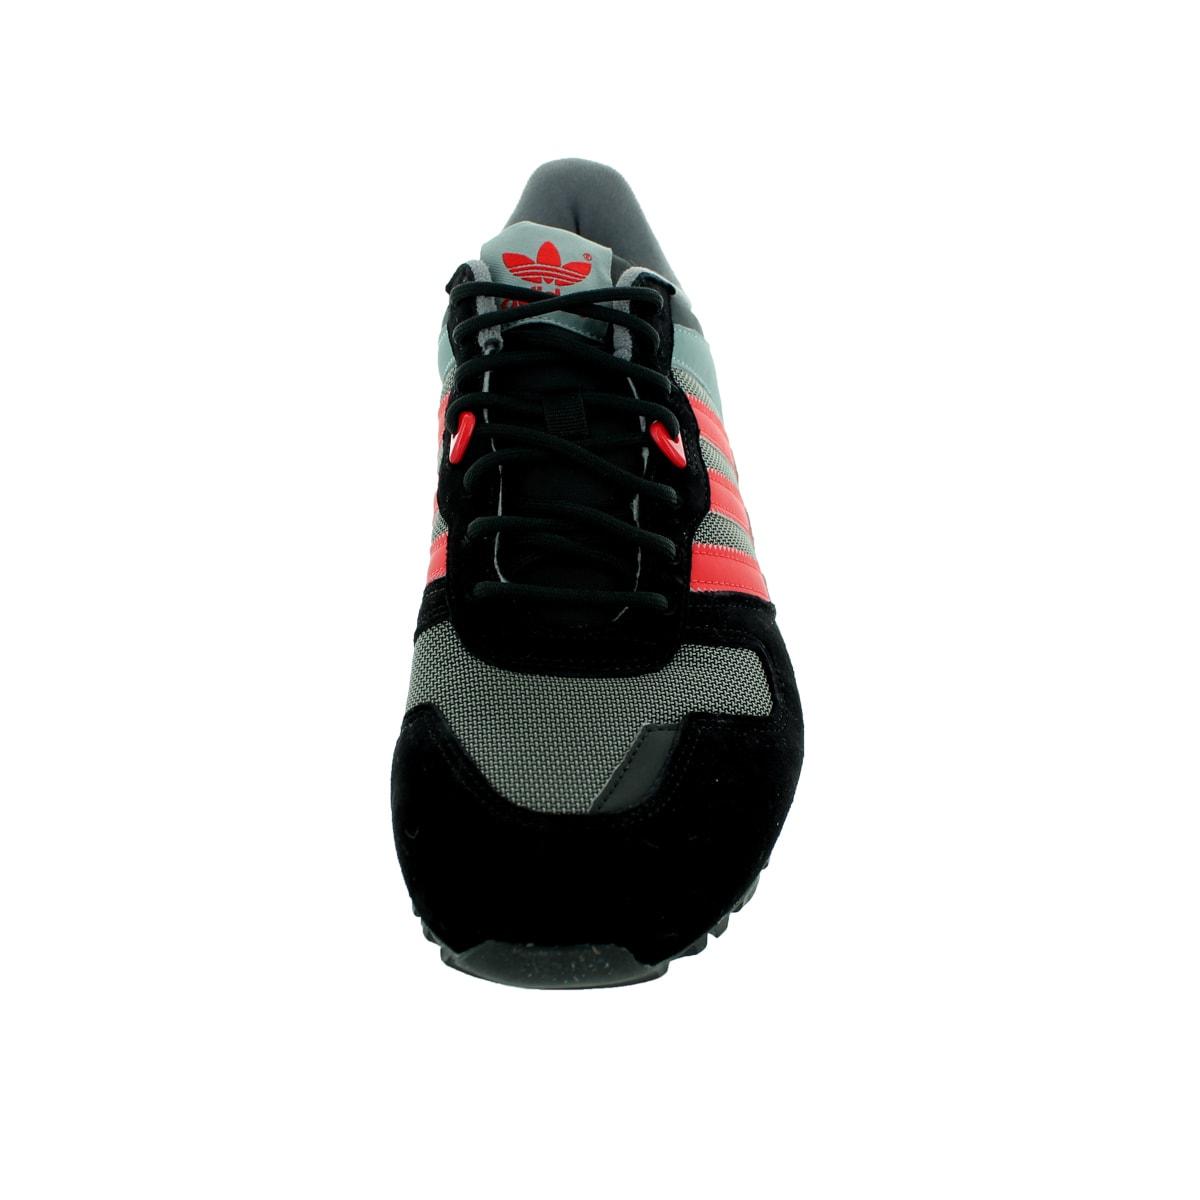 c6a4cdb1e Shop Adidas Men s Zx 700 Originals Black Tomato  Running Shoe - Free  Shipping Today - Overstock - 12319887